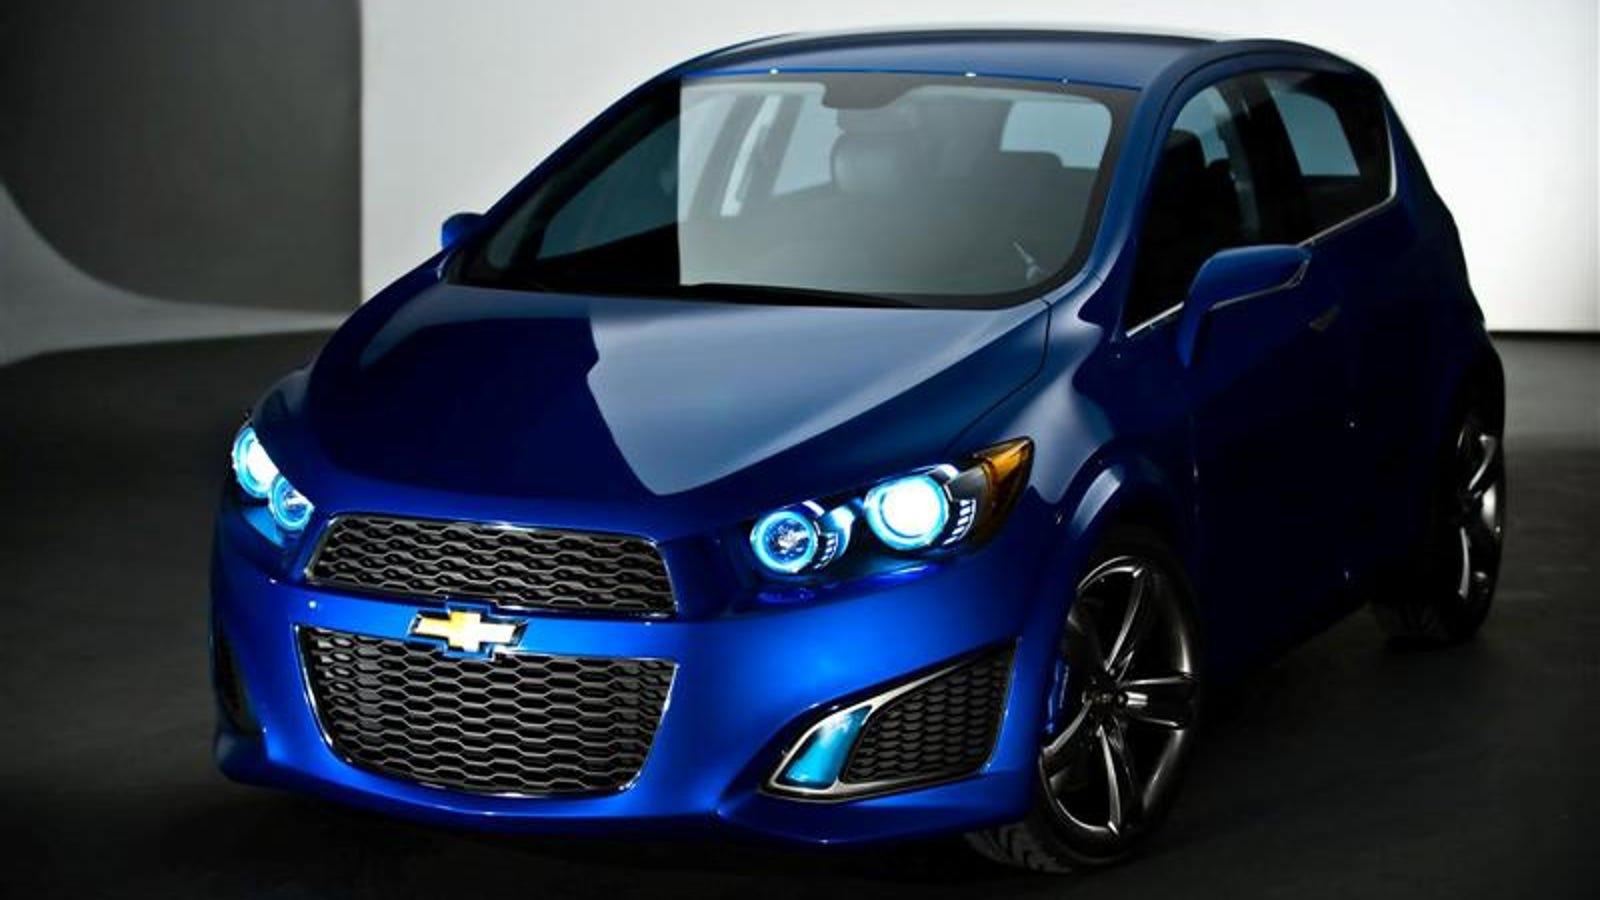 Chevrolet Sonic Repair Manual: Fluid Cooler Inlet Hose Replacement